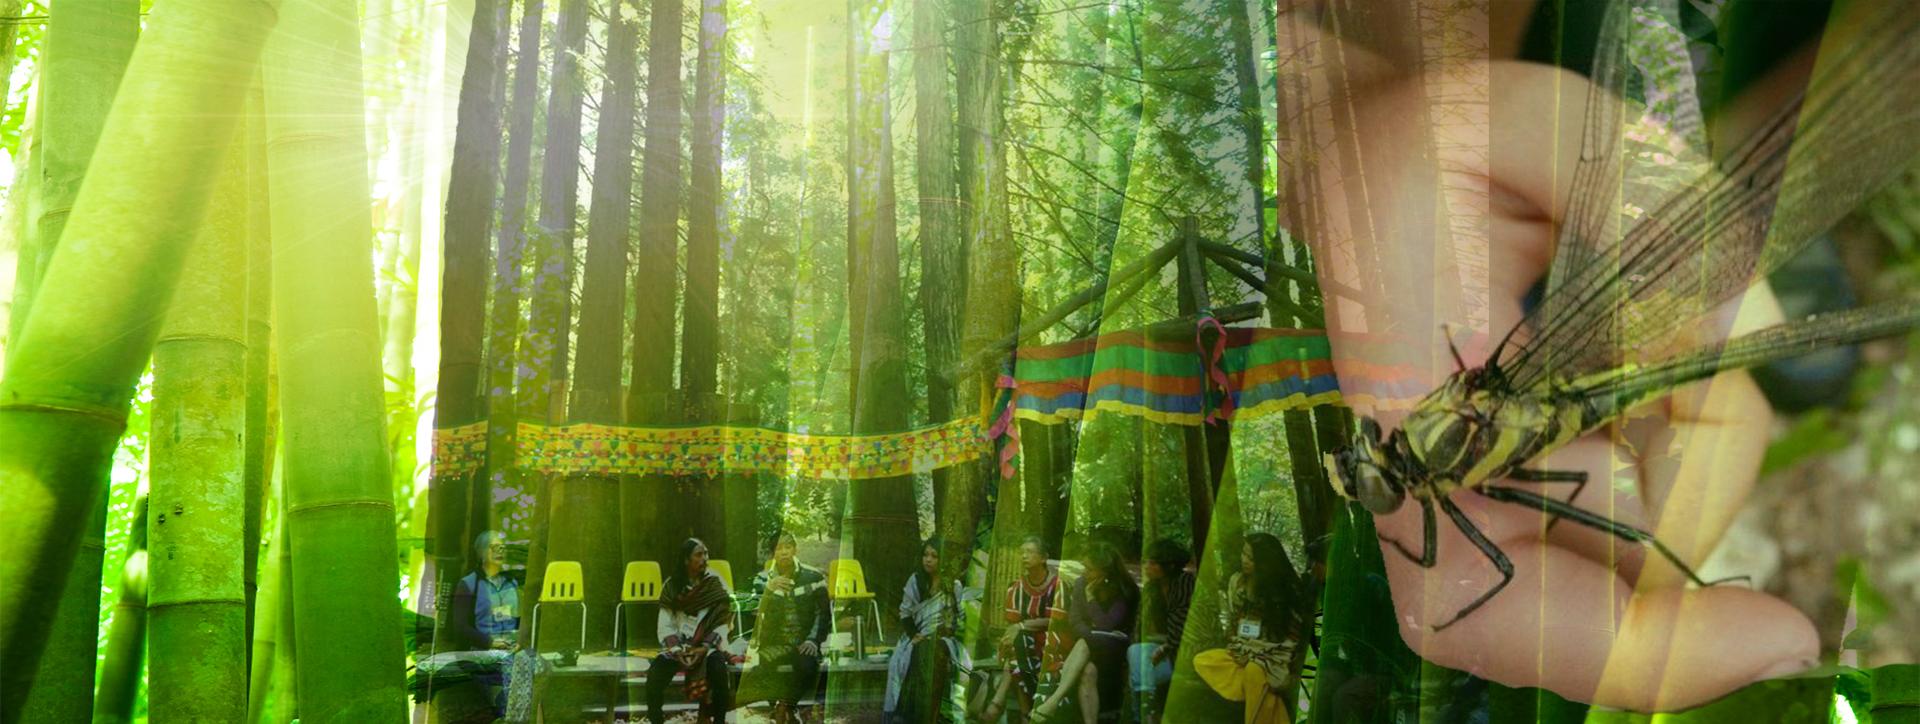 Bamboo Gathering